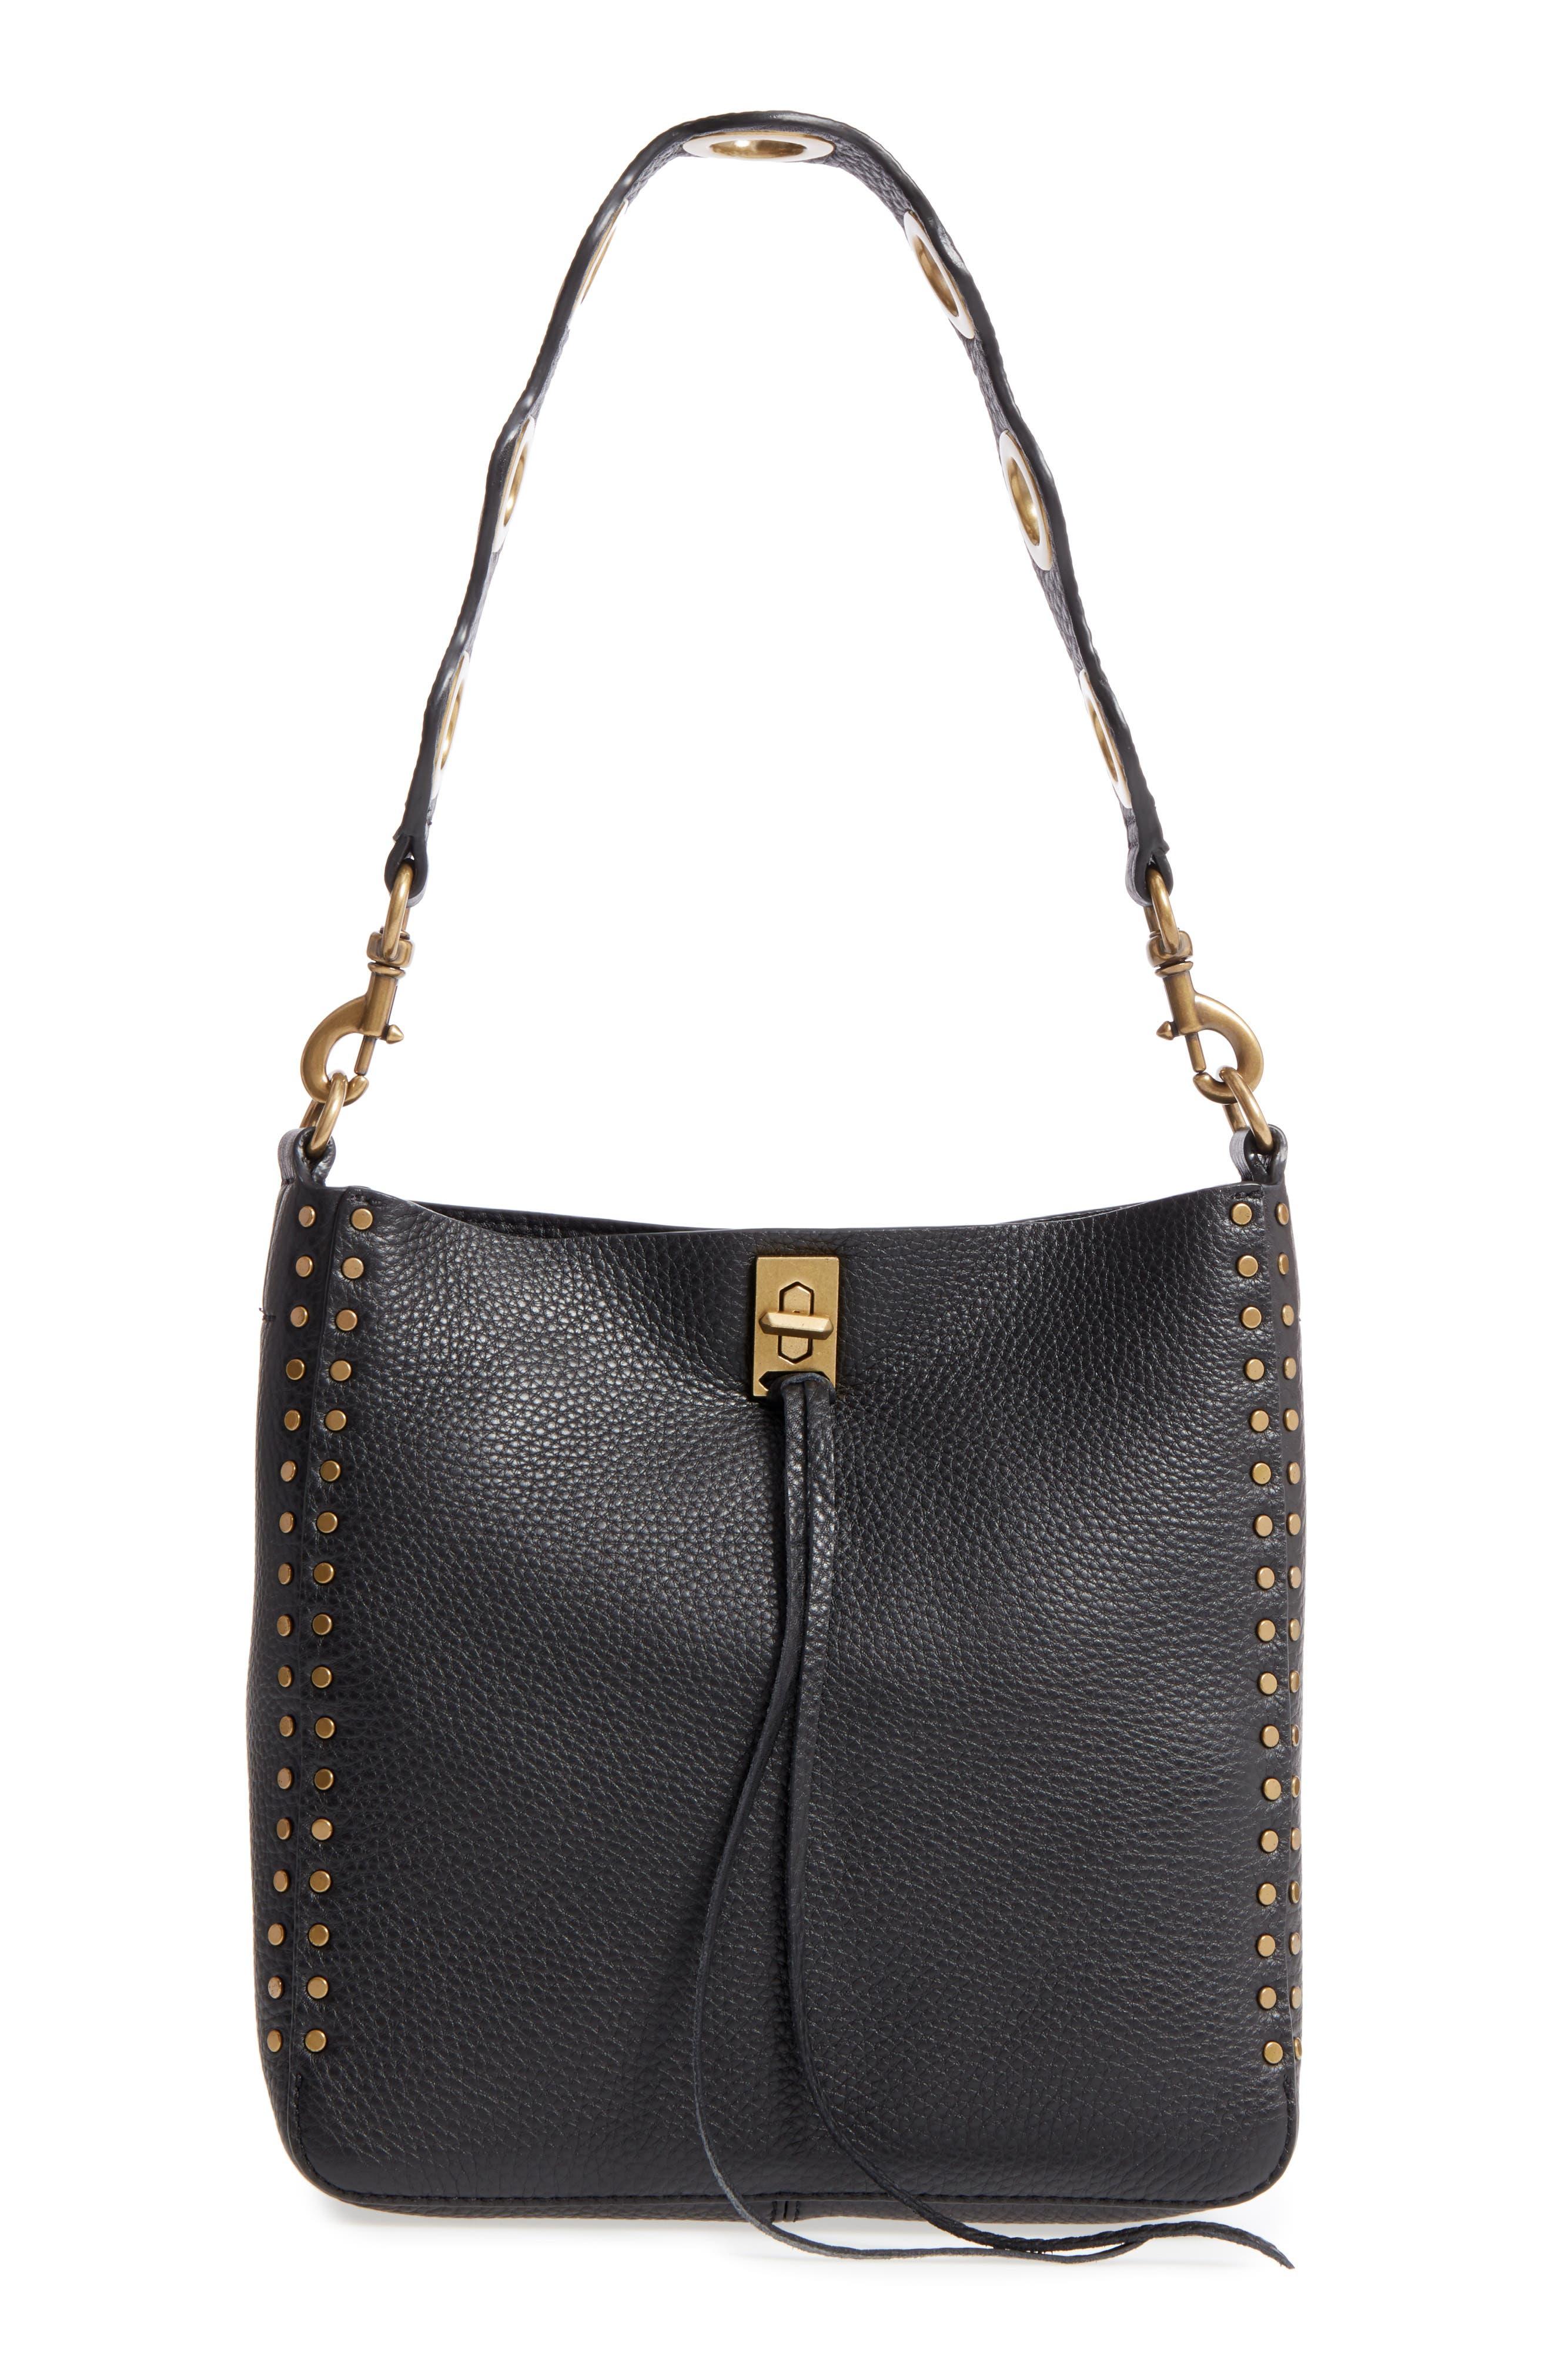 0556ed662ca7 Women s Shoulder Bags Sale